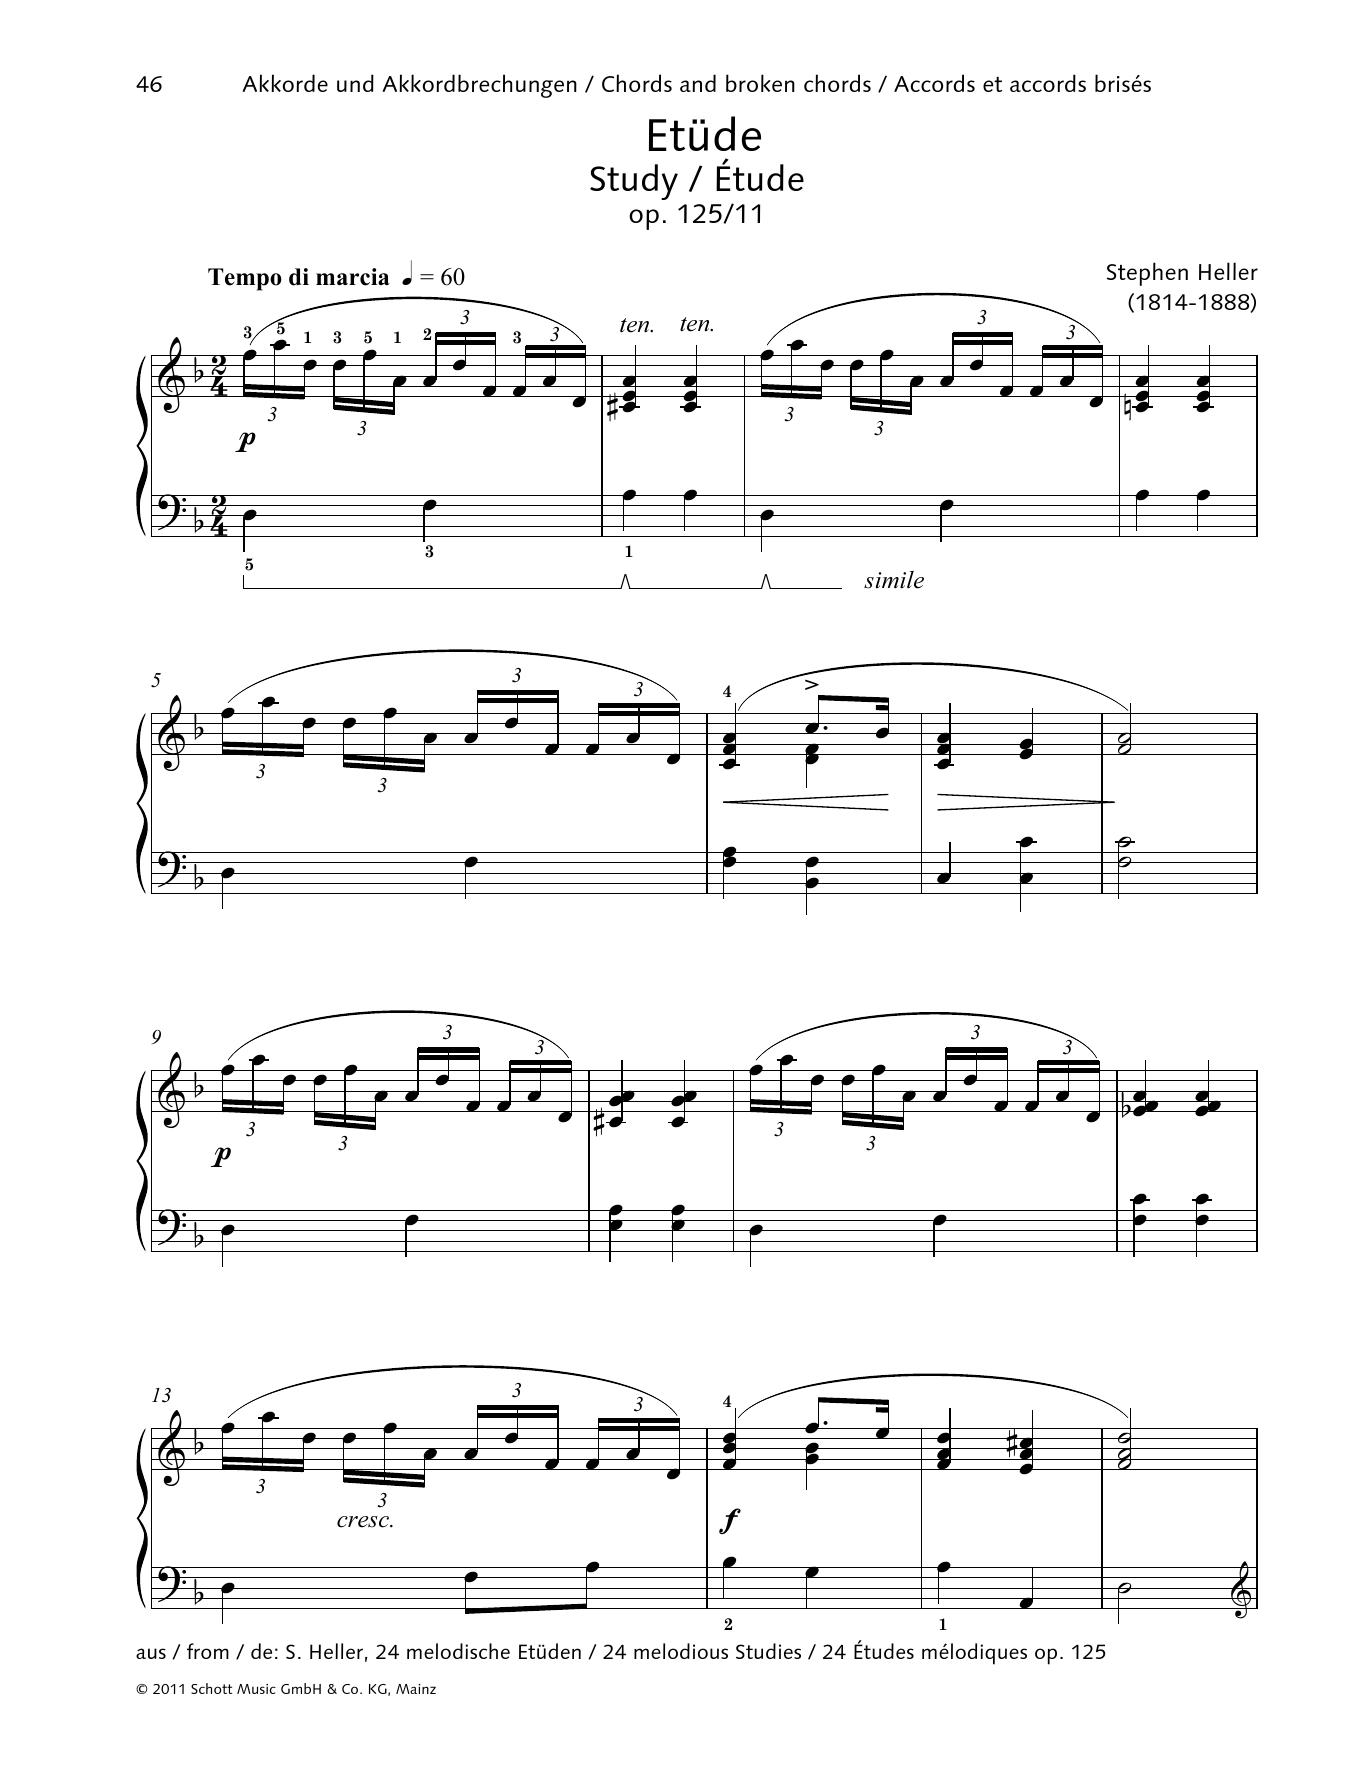 Stephen Heller Study sheet music notes printable PDF score